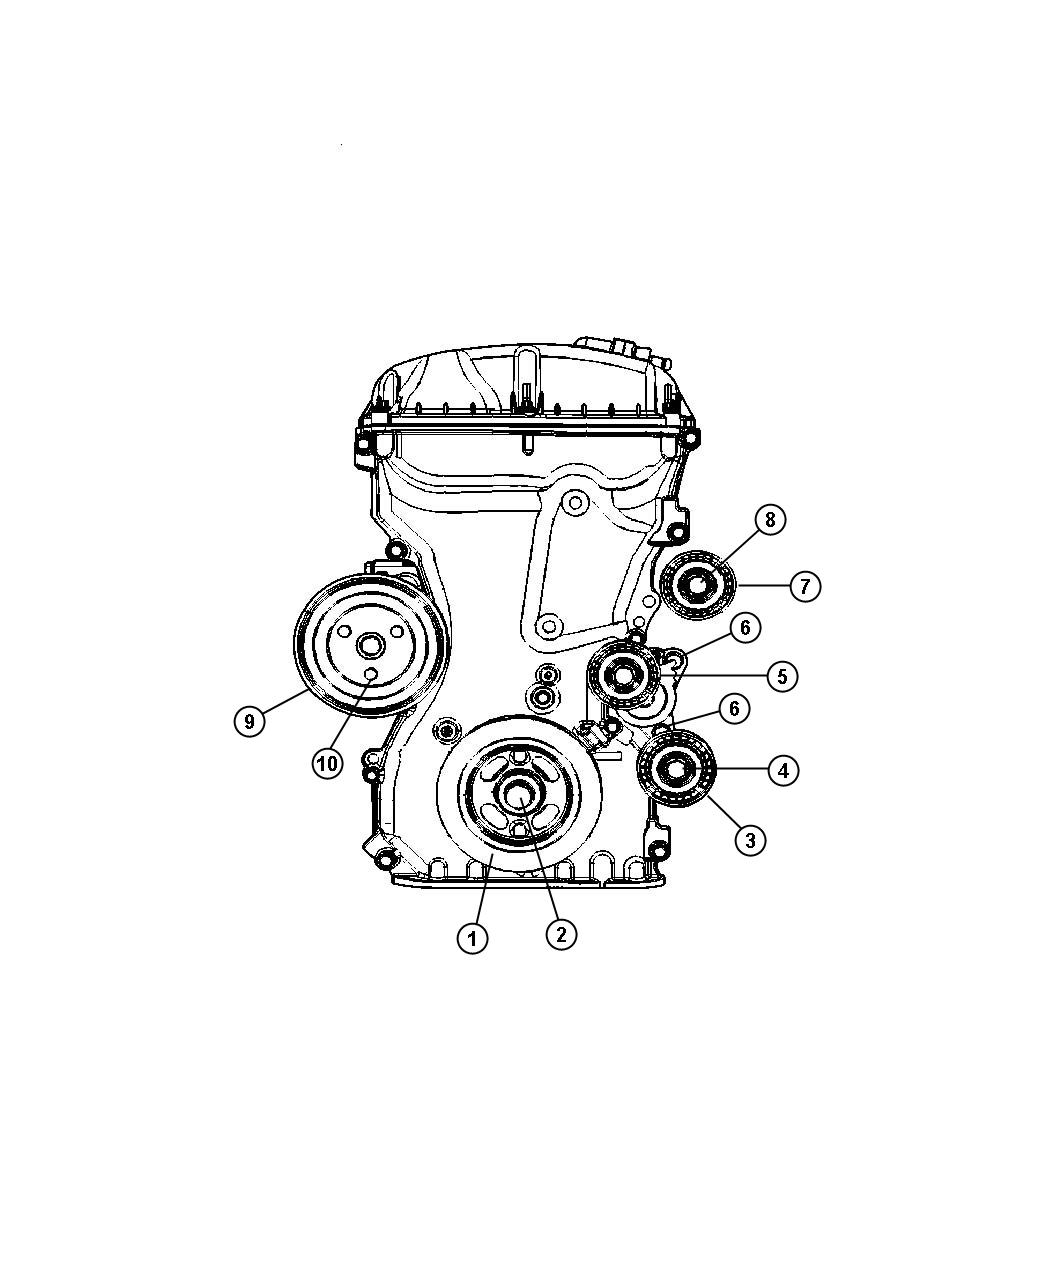 Dodge Caliber Pulley. Water pump. Engine, dual, vvt